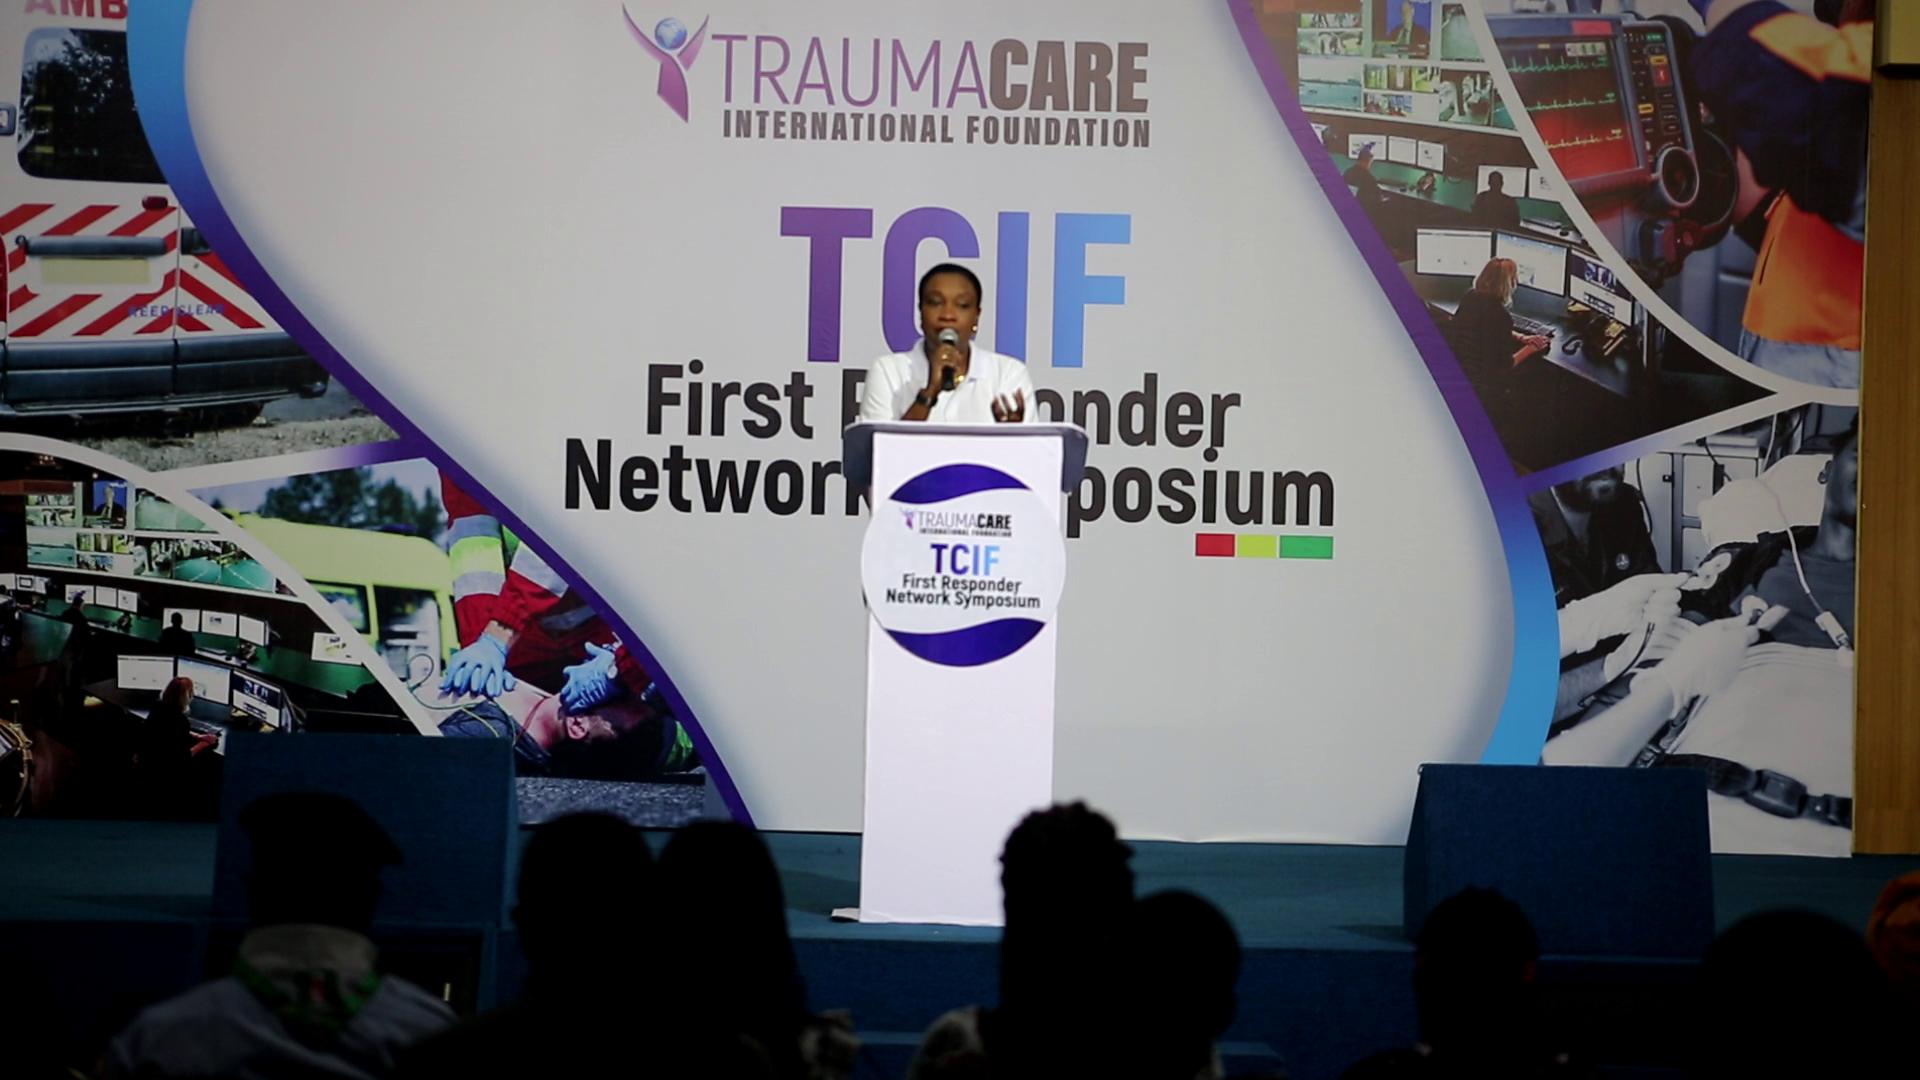 TCIF First Responder Network Online Symposium